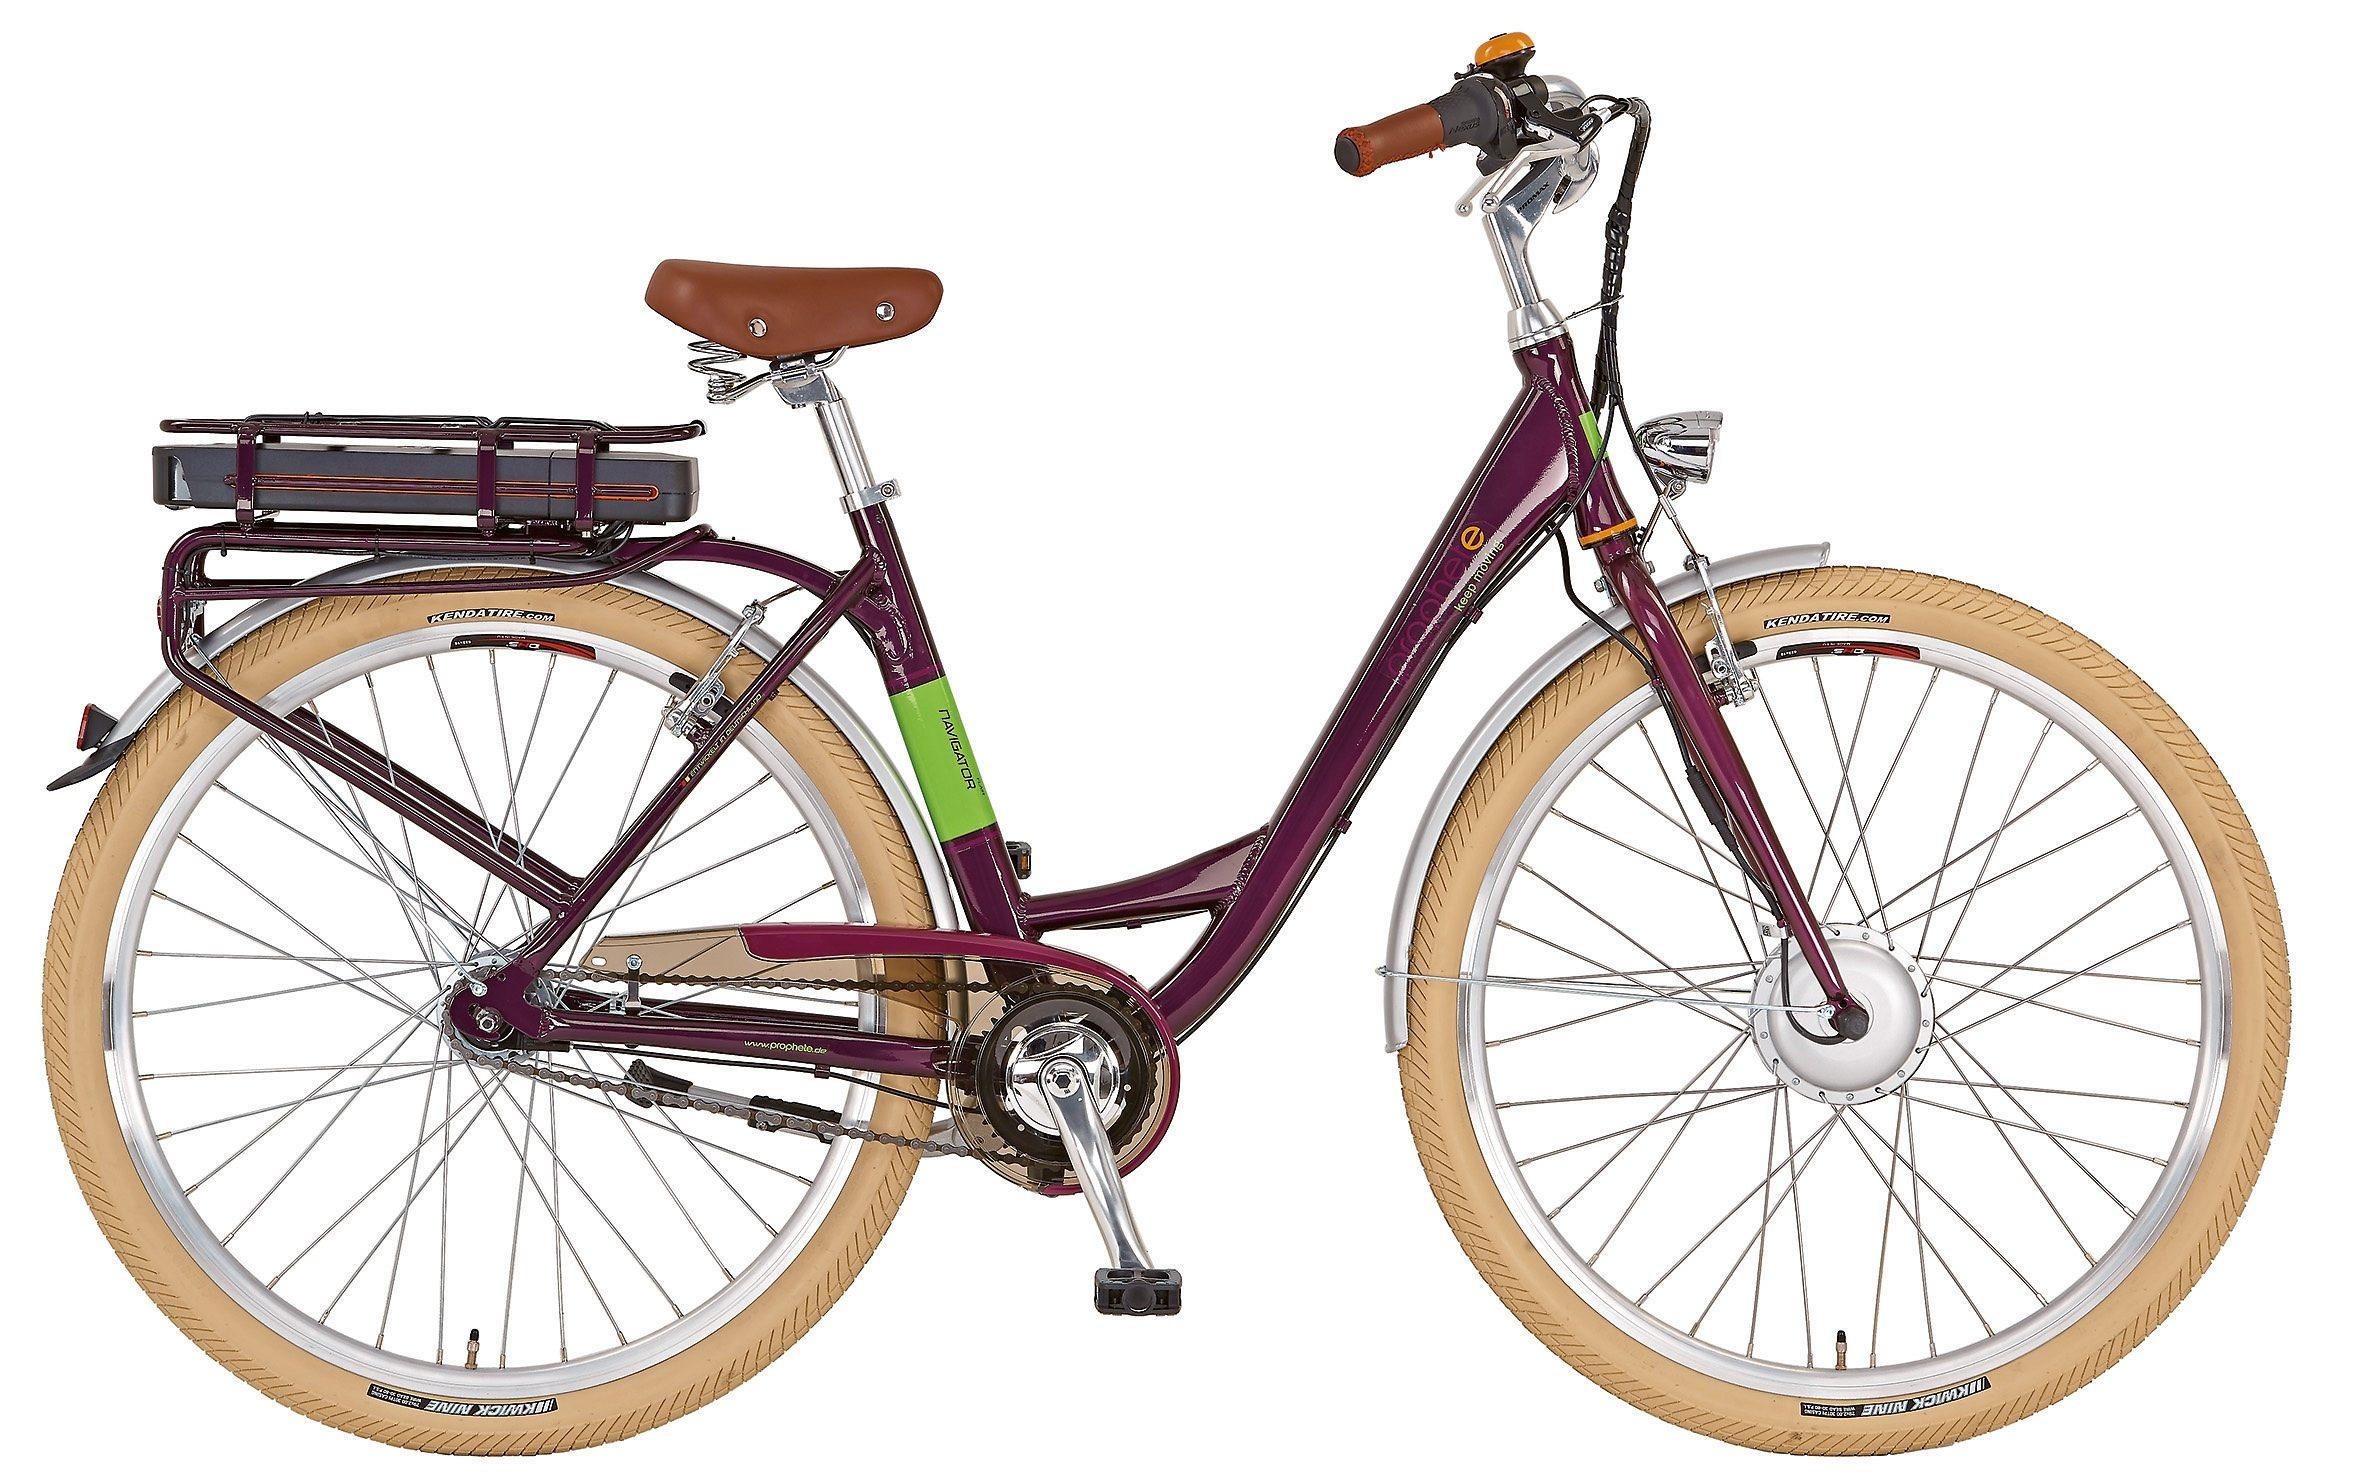 Prophete Damen City E-Bike, 28 Zoll, 7 Gg Shimano, inkl. Smartphone Tasche, »Navigator Flair«